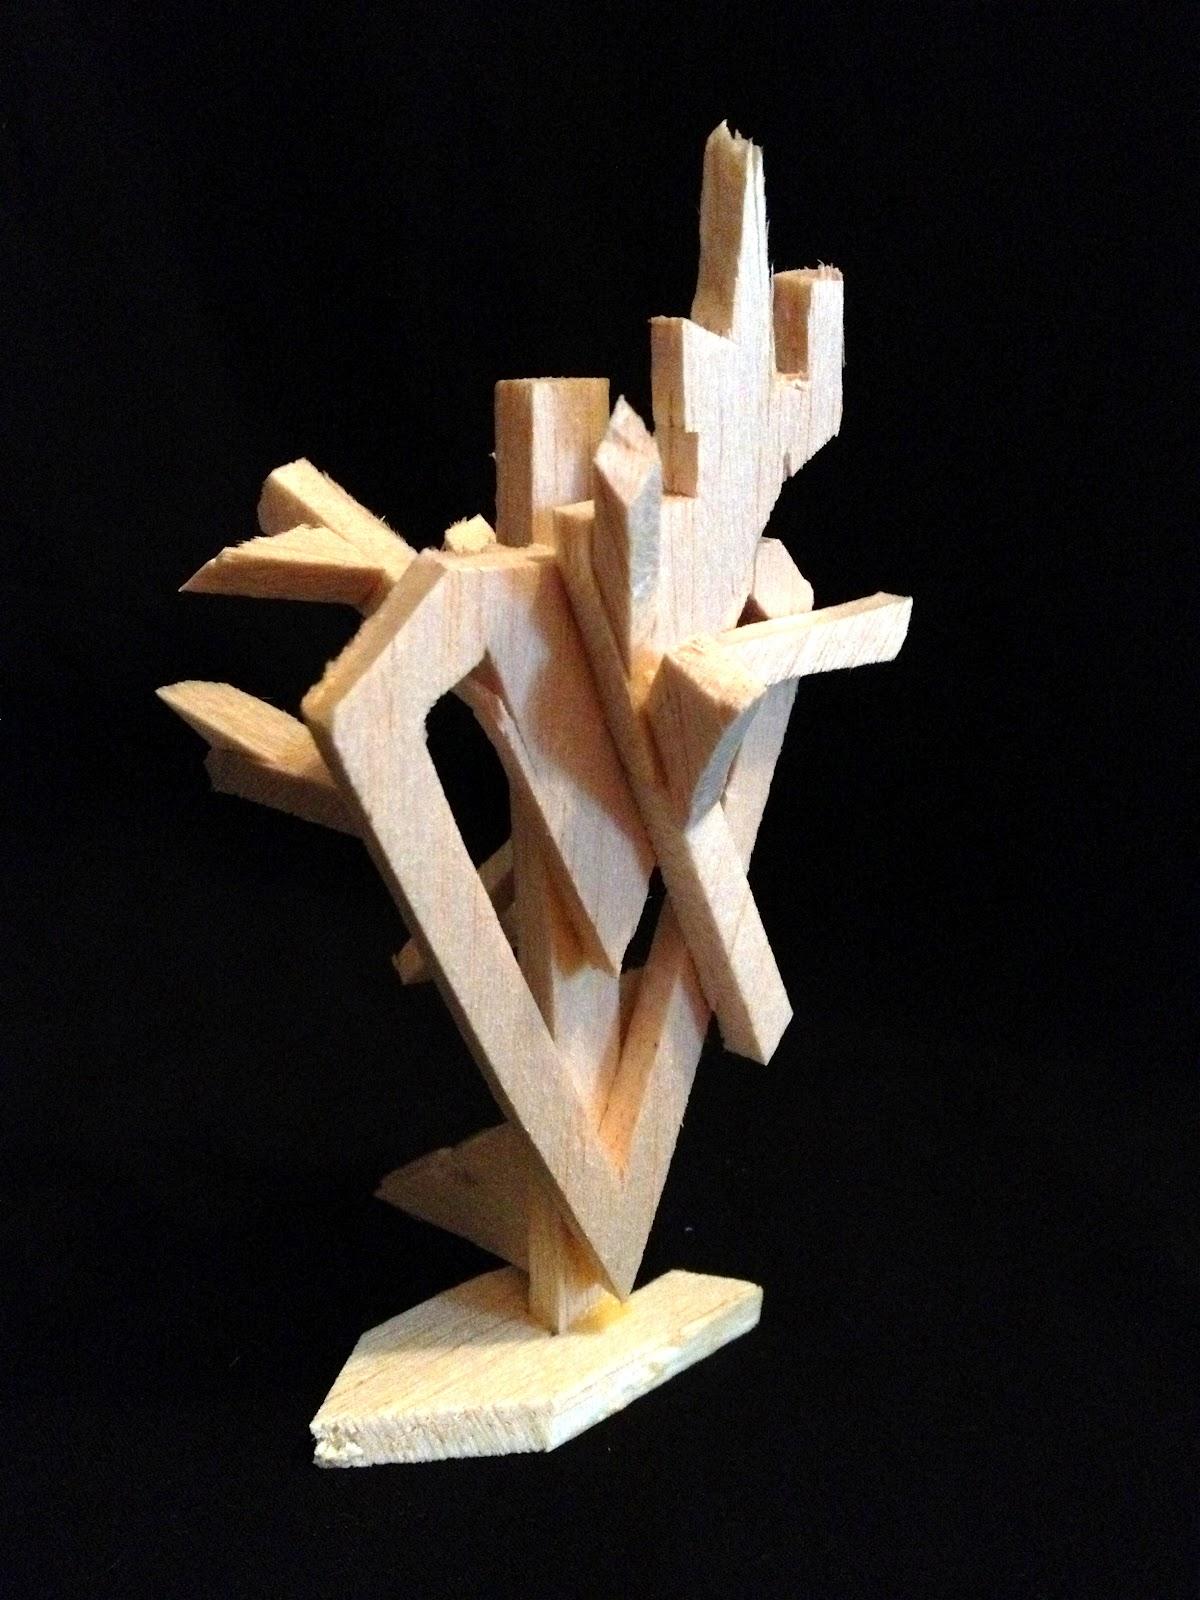 3D Design: Expressive 3D Forms